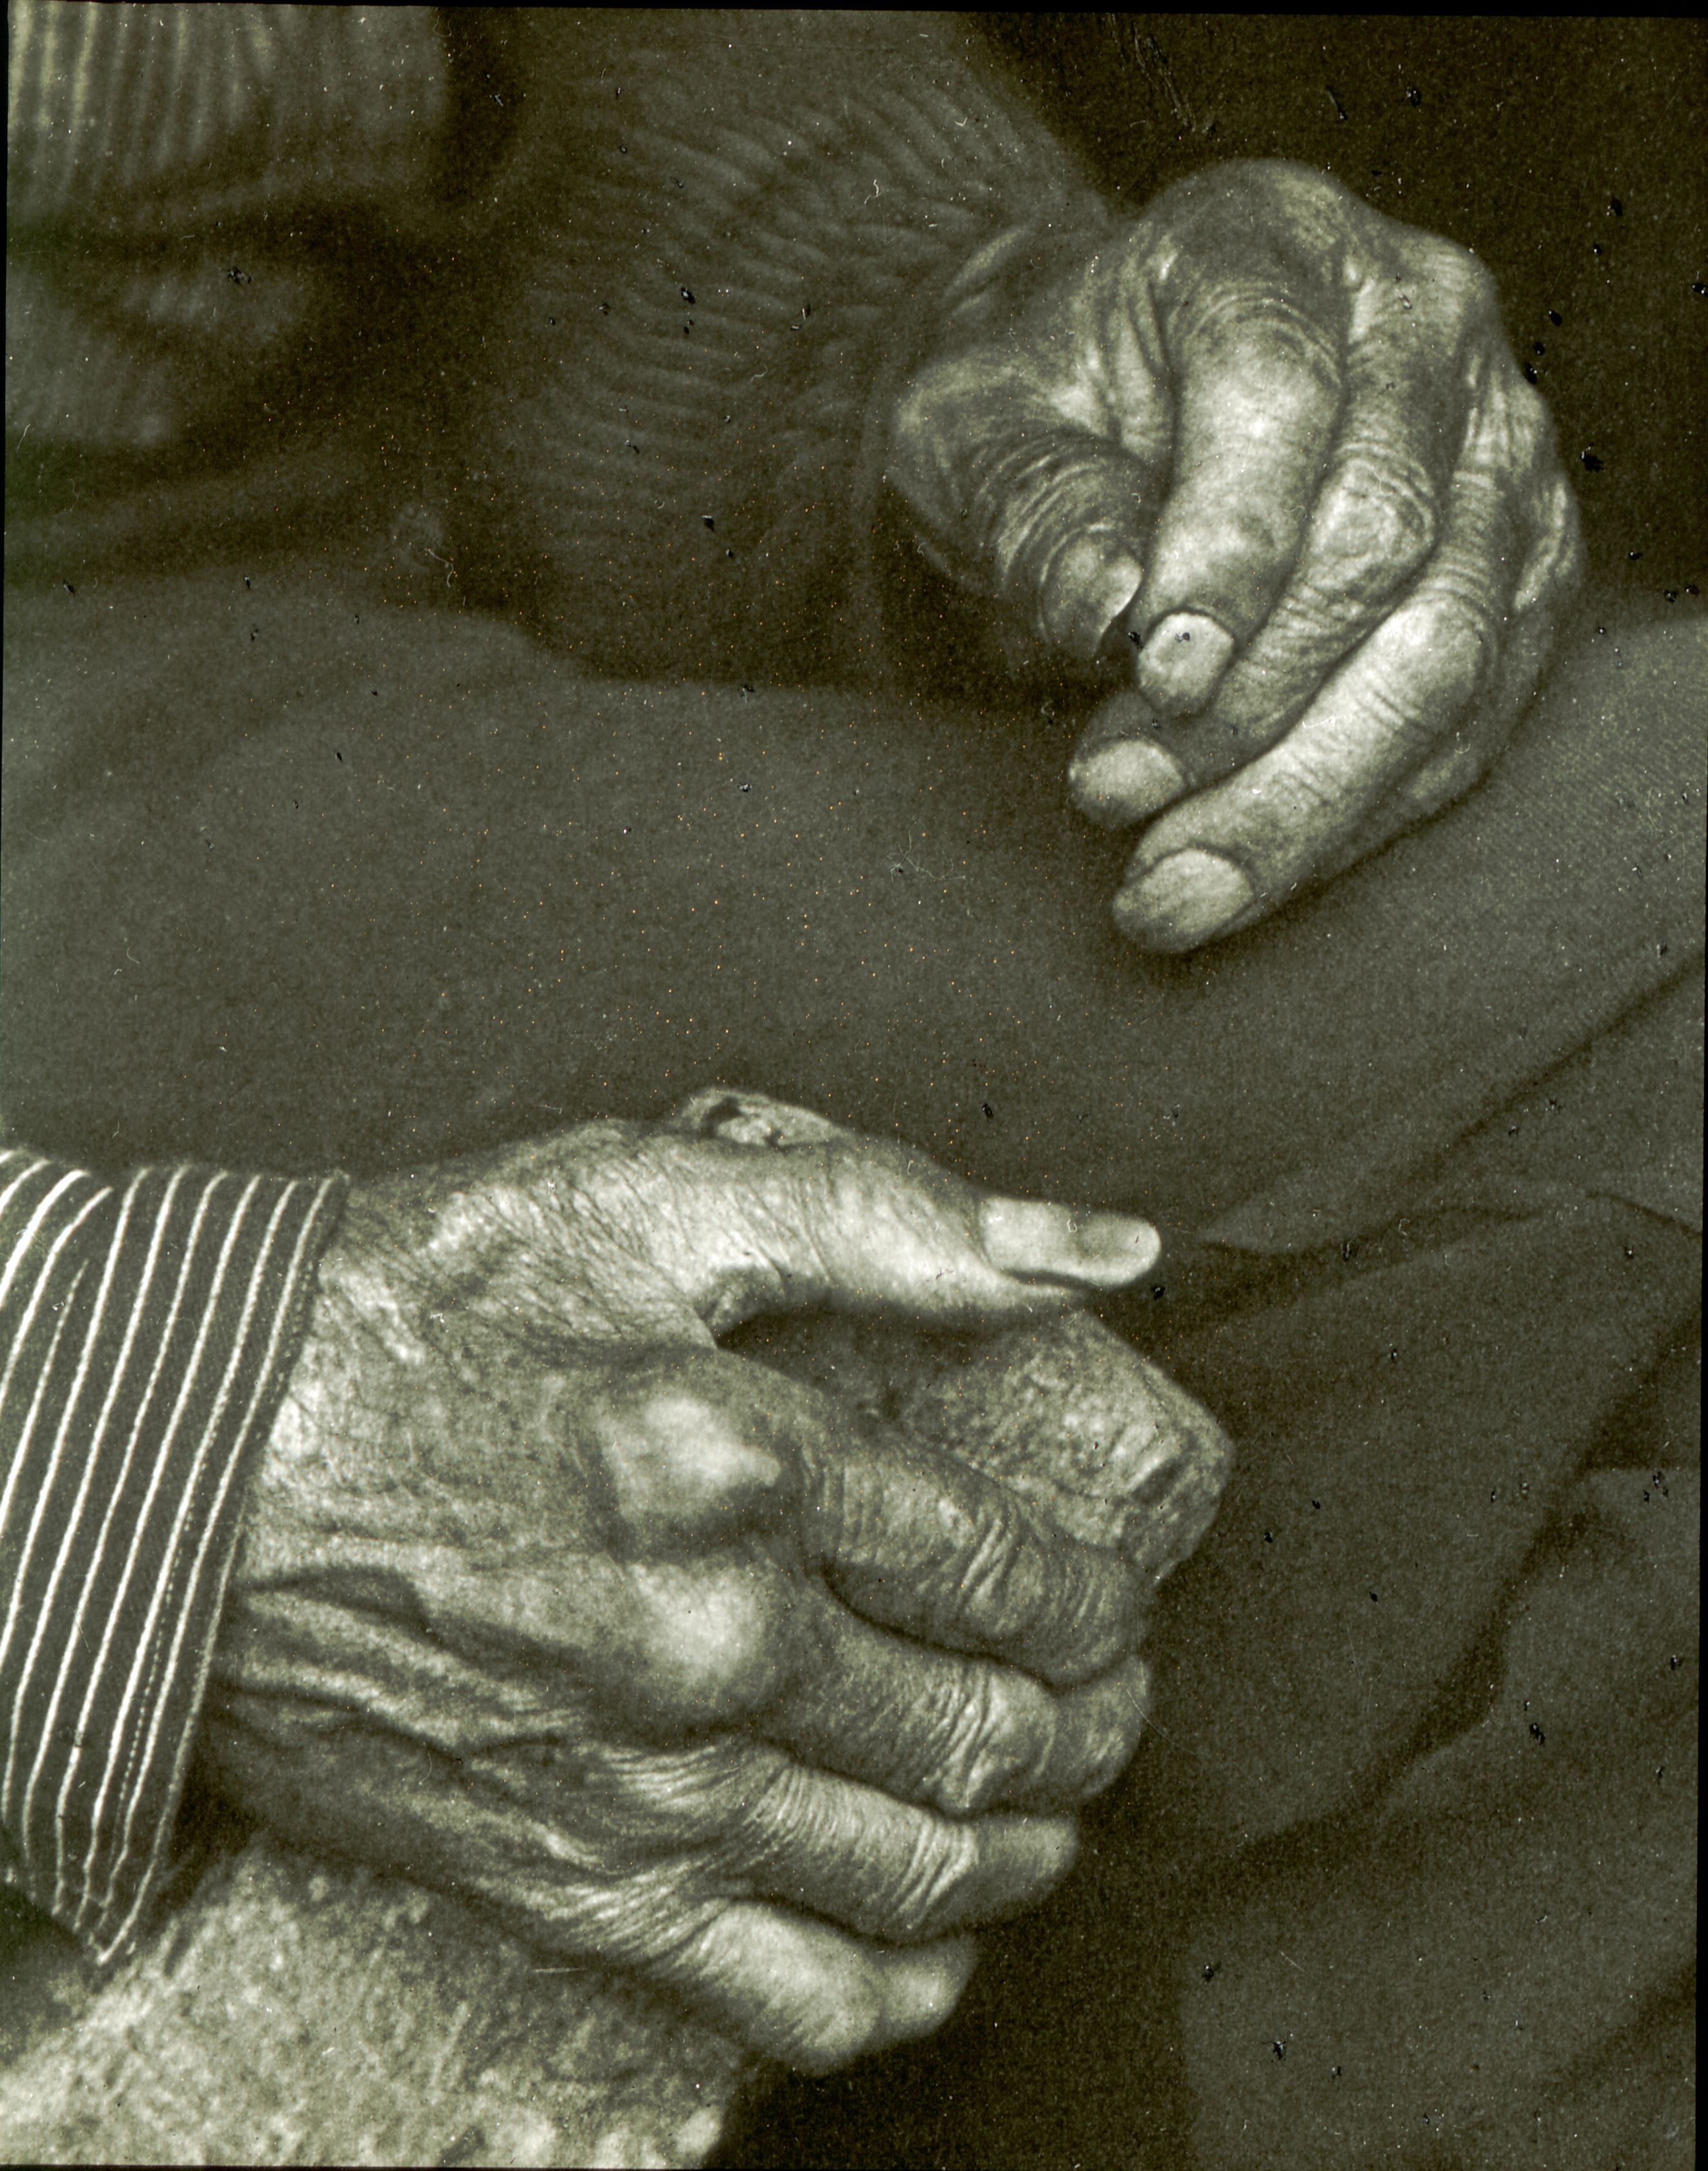 Image of Doris Ulmann from Wikidata